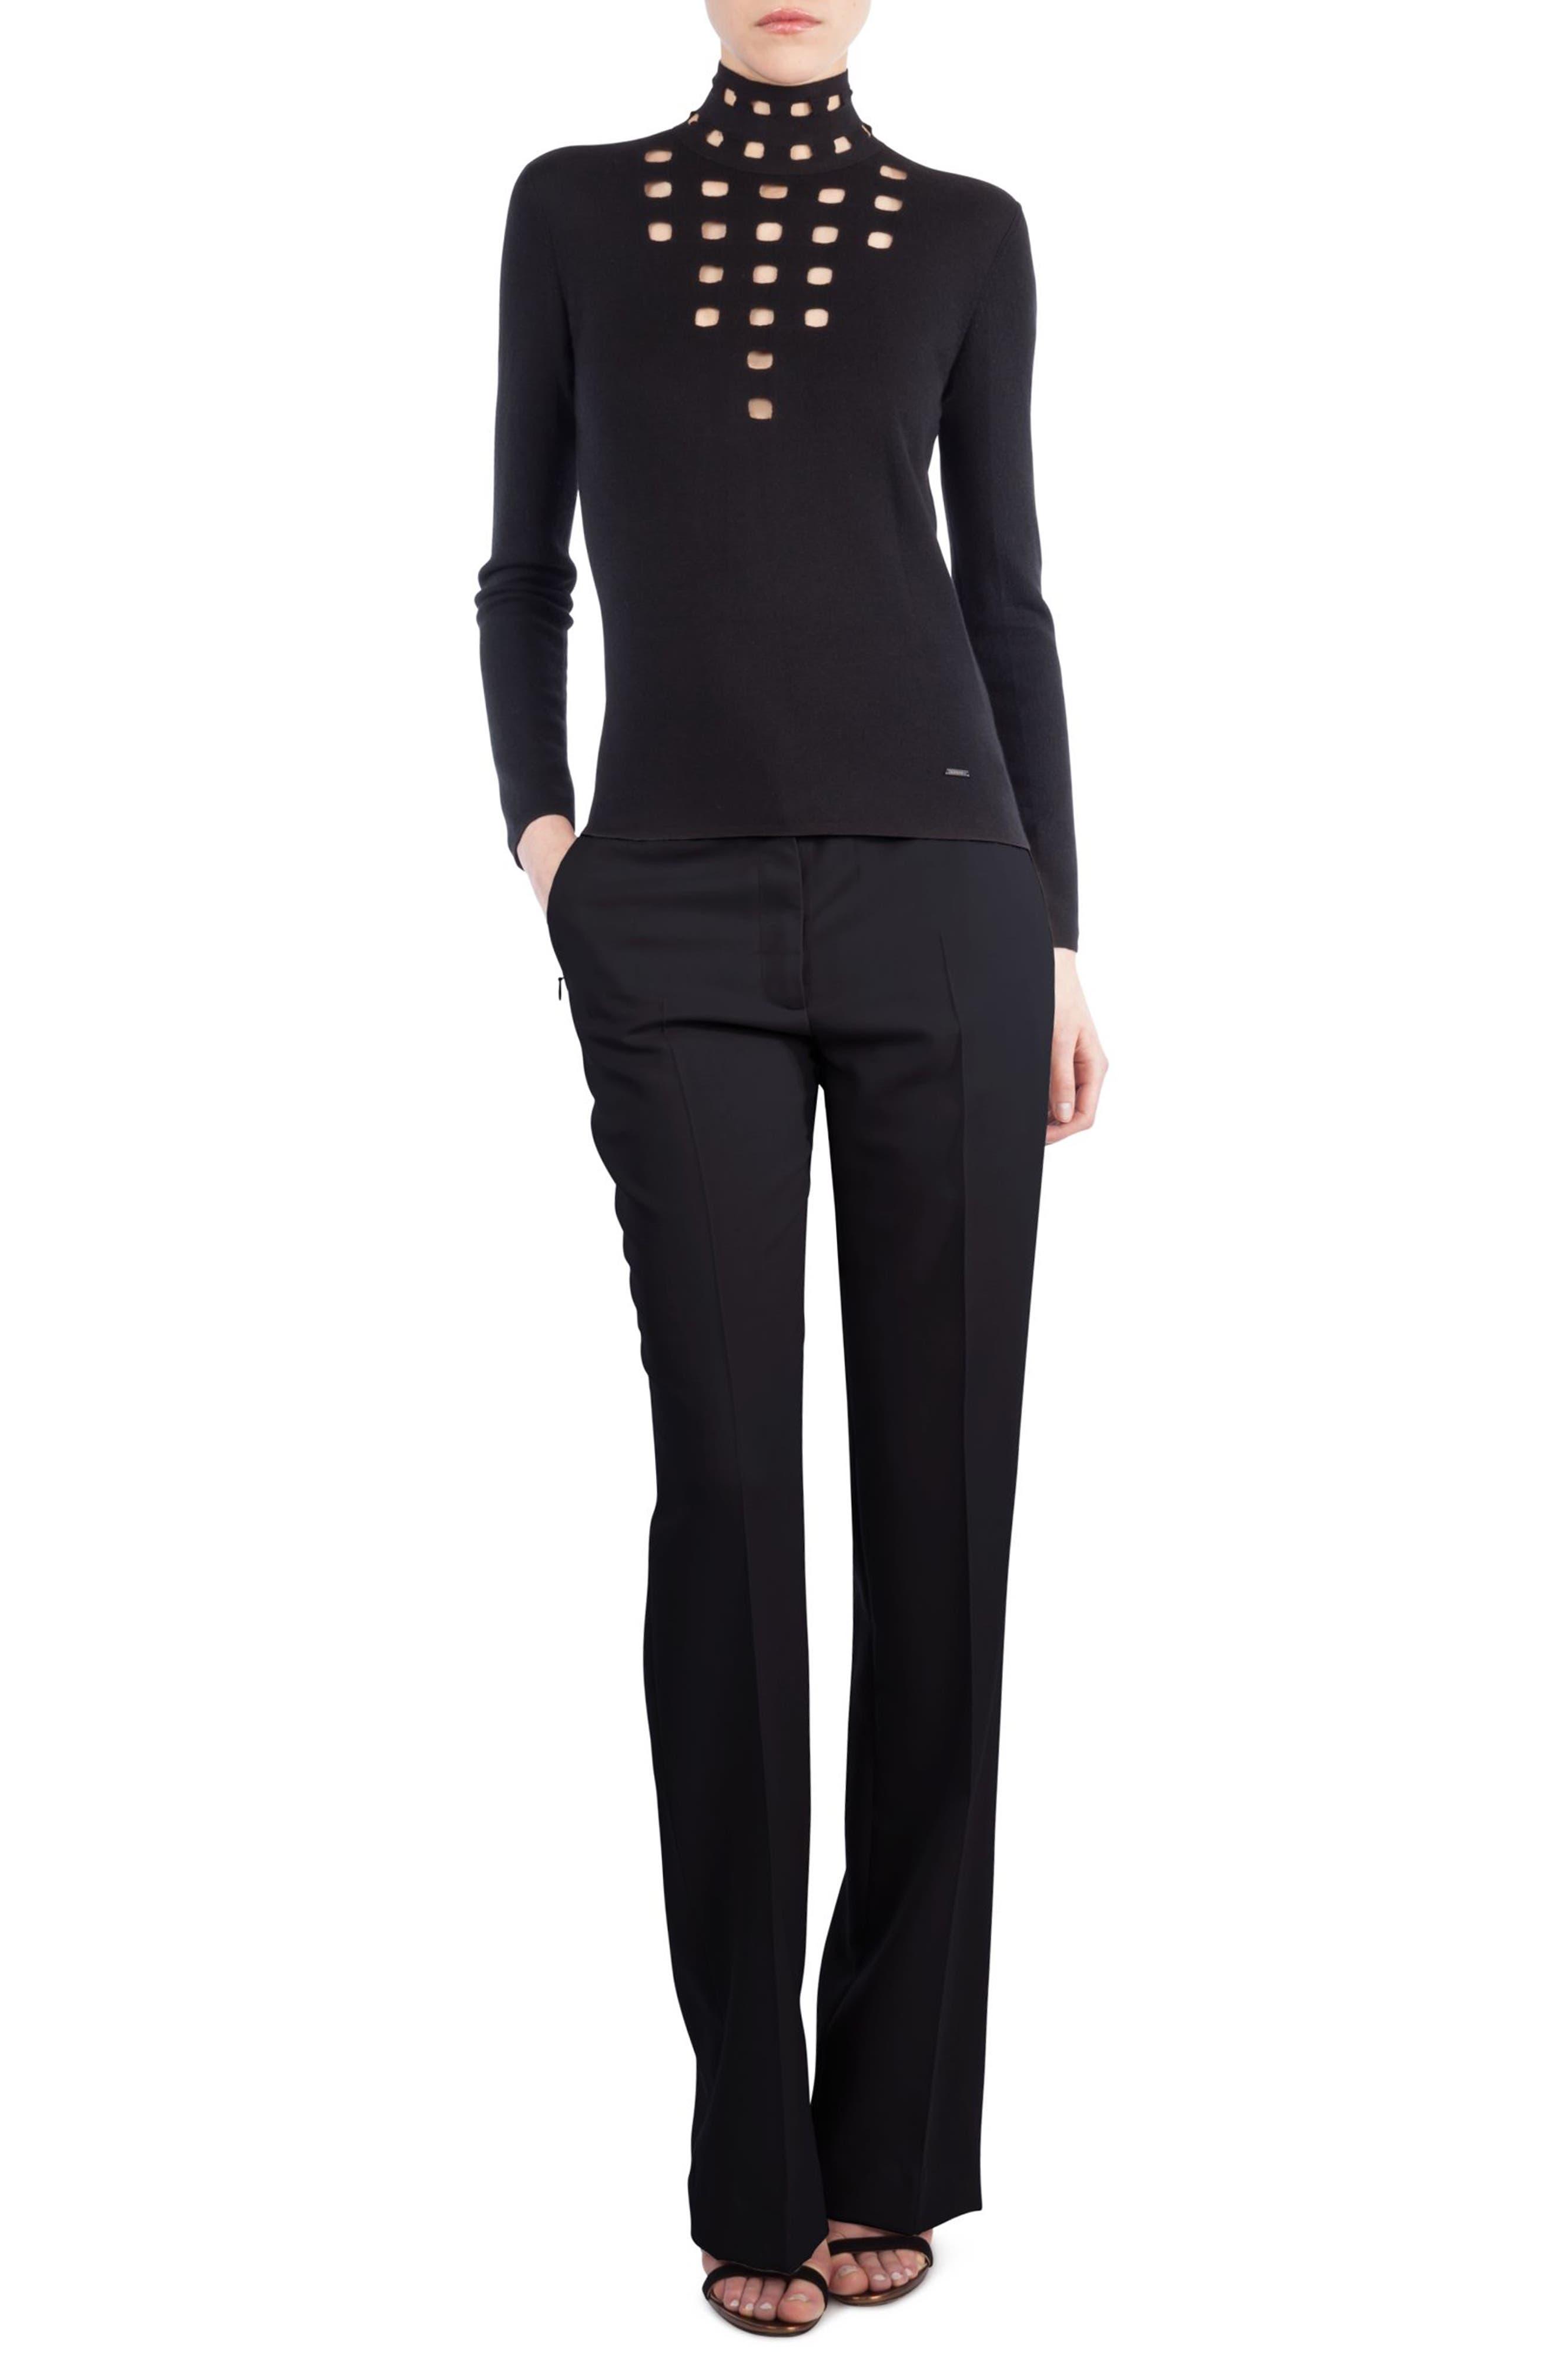 Alternate Image 1 Selected - Akris St. Gallen Cutout Cashmere & Silk Turtleneck Sweater